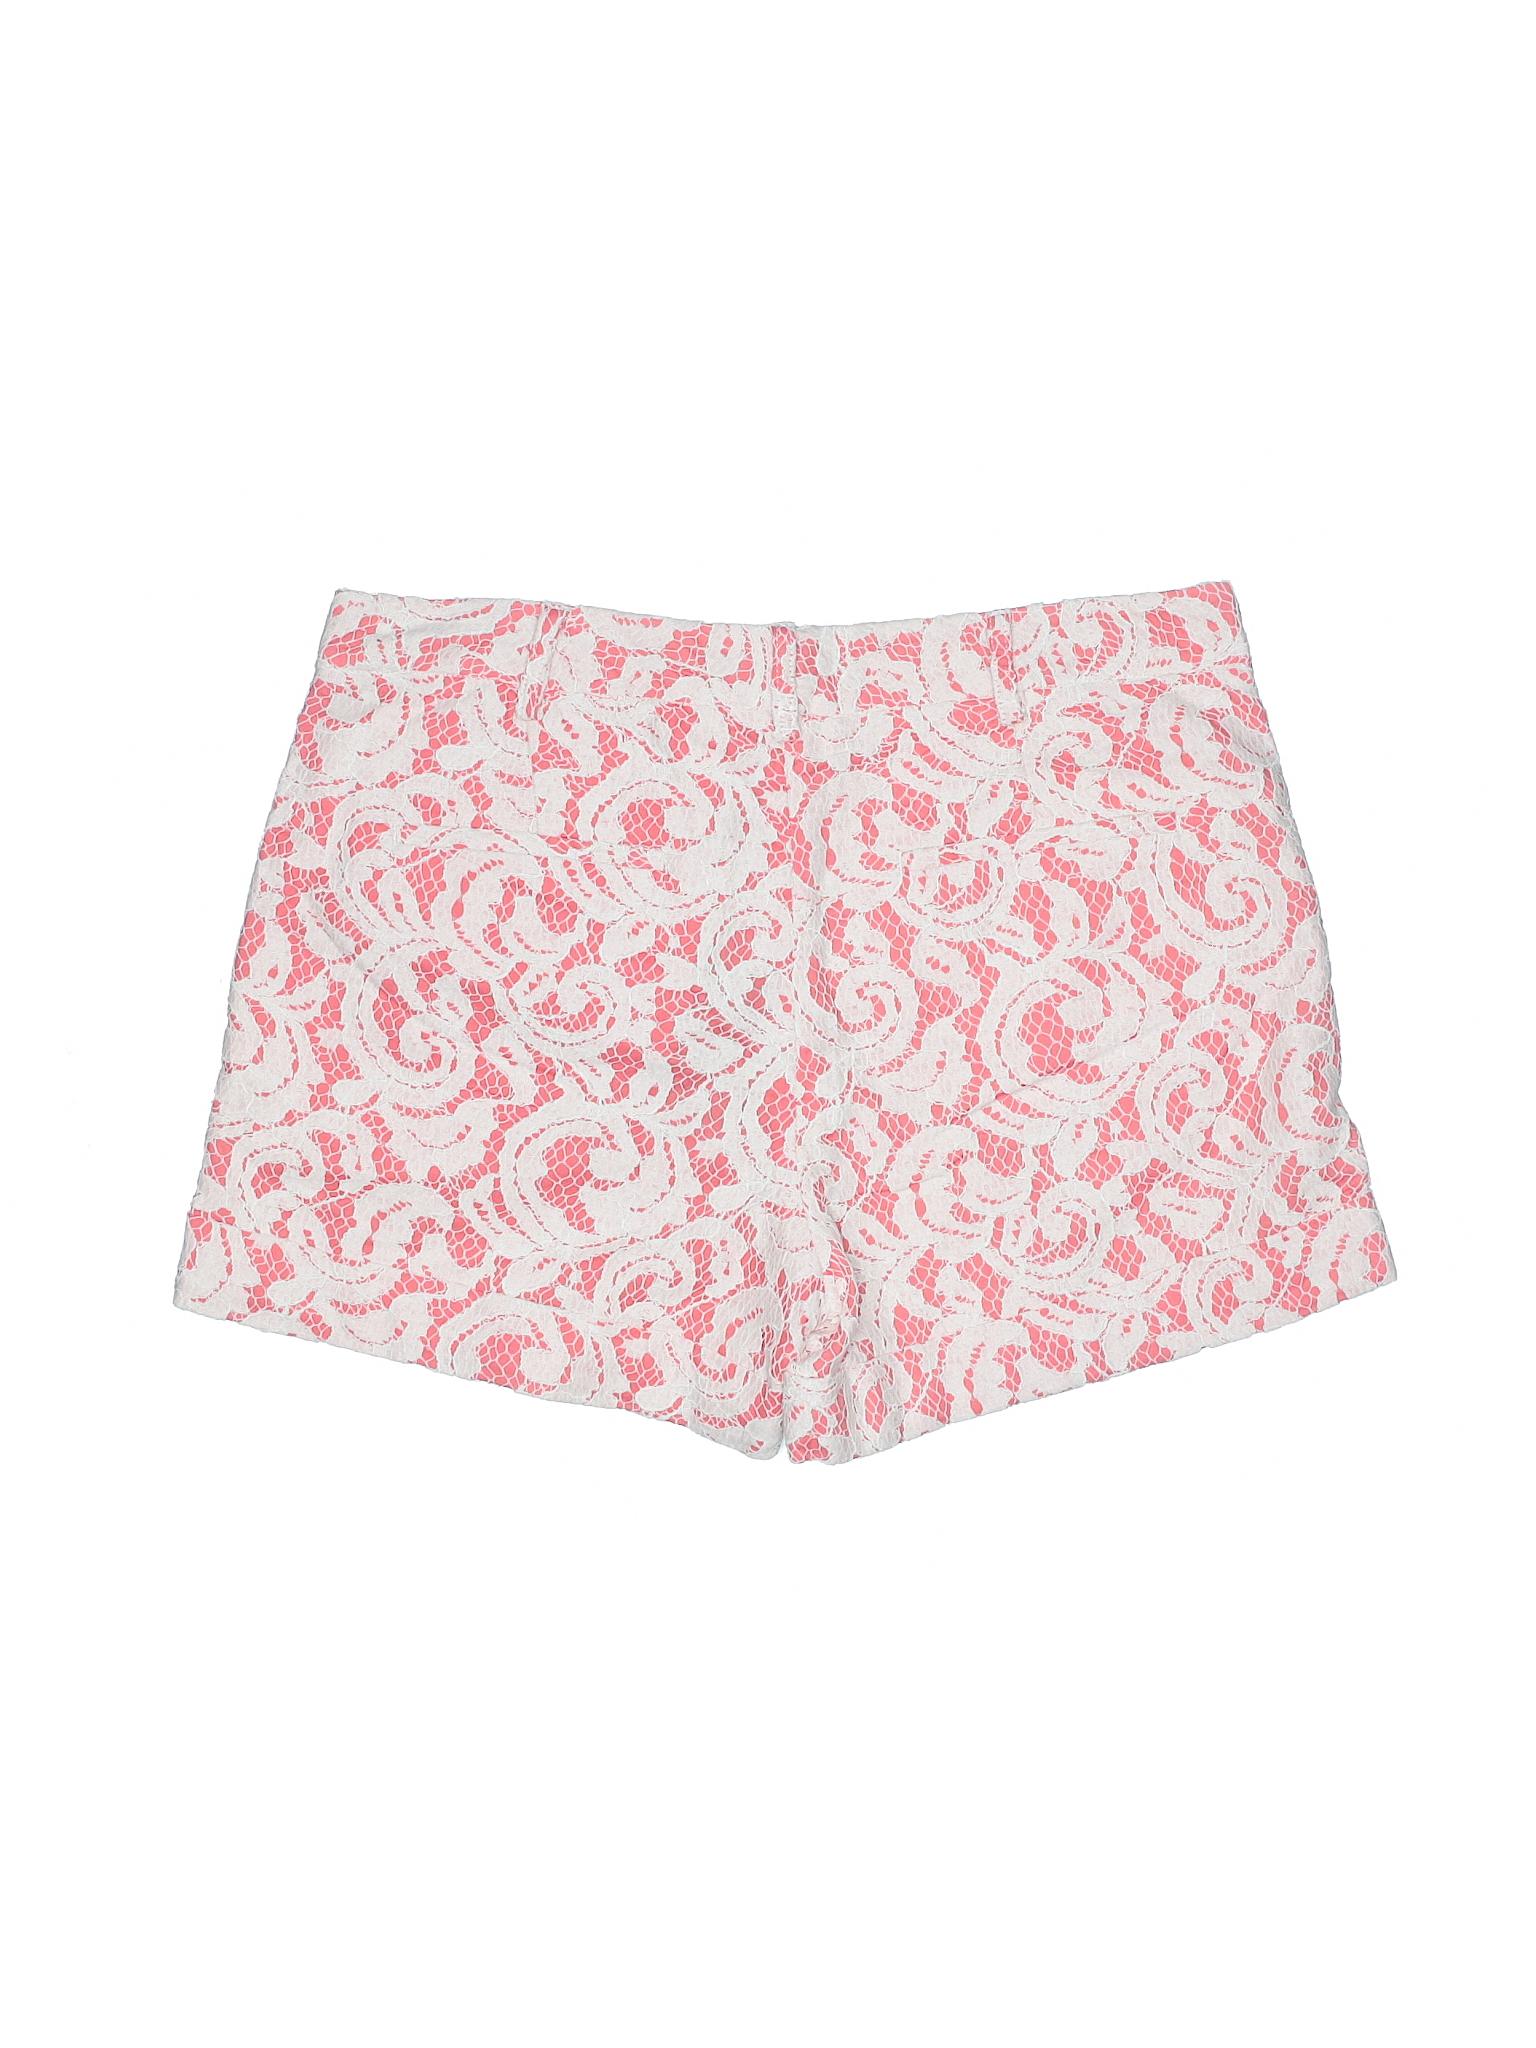 Tart Shorts Tart Tart Shorts leisure leisure Boutique Collections Boutique Collections leisure Boutique qx7wHIaX